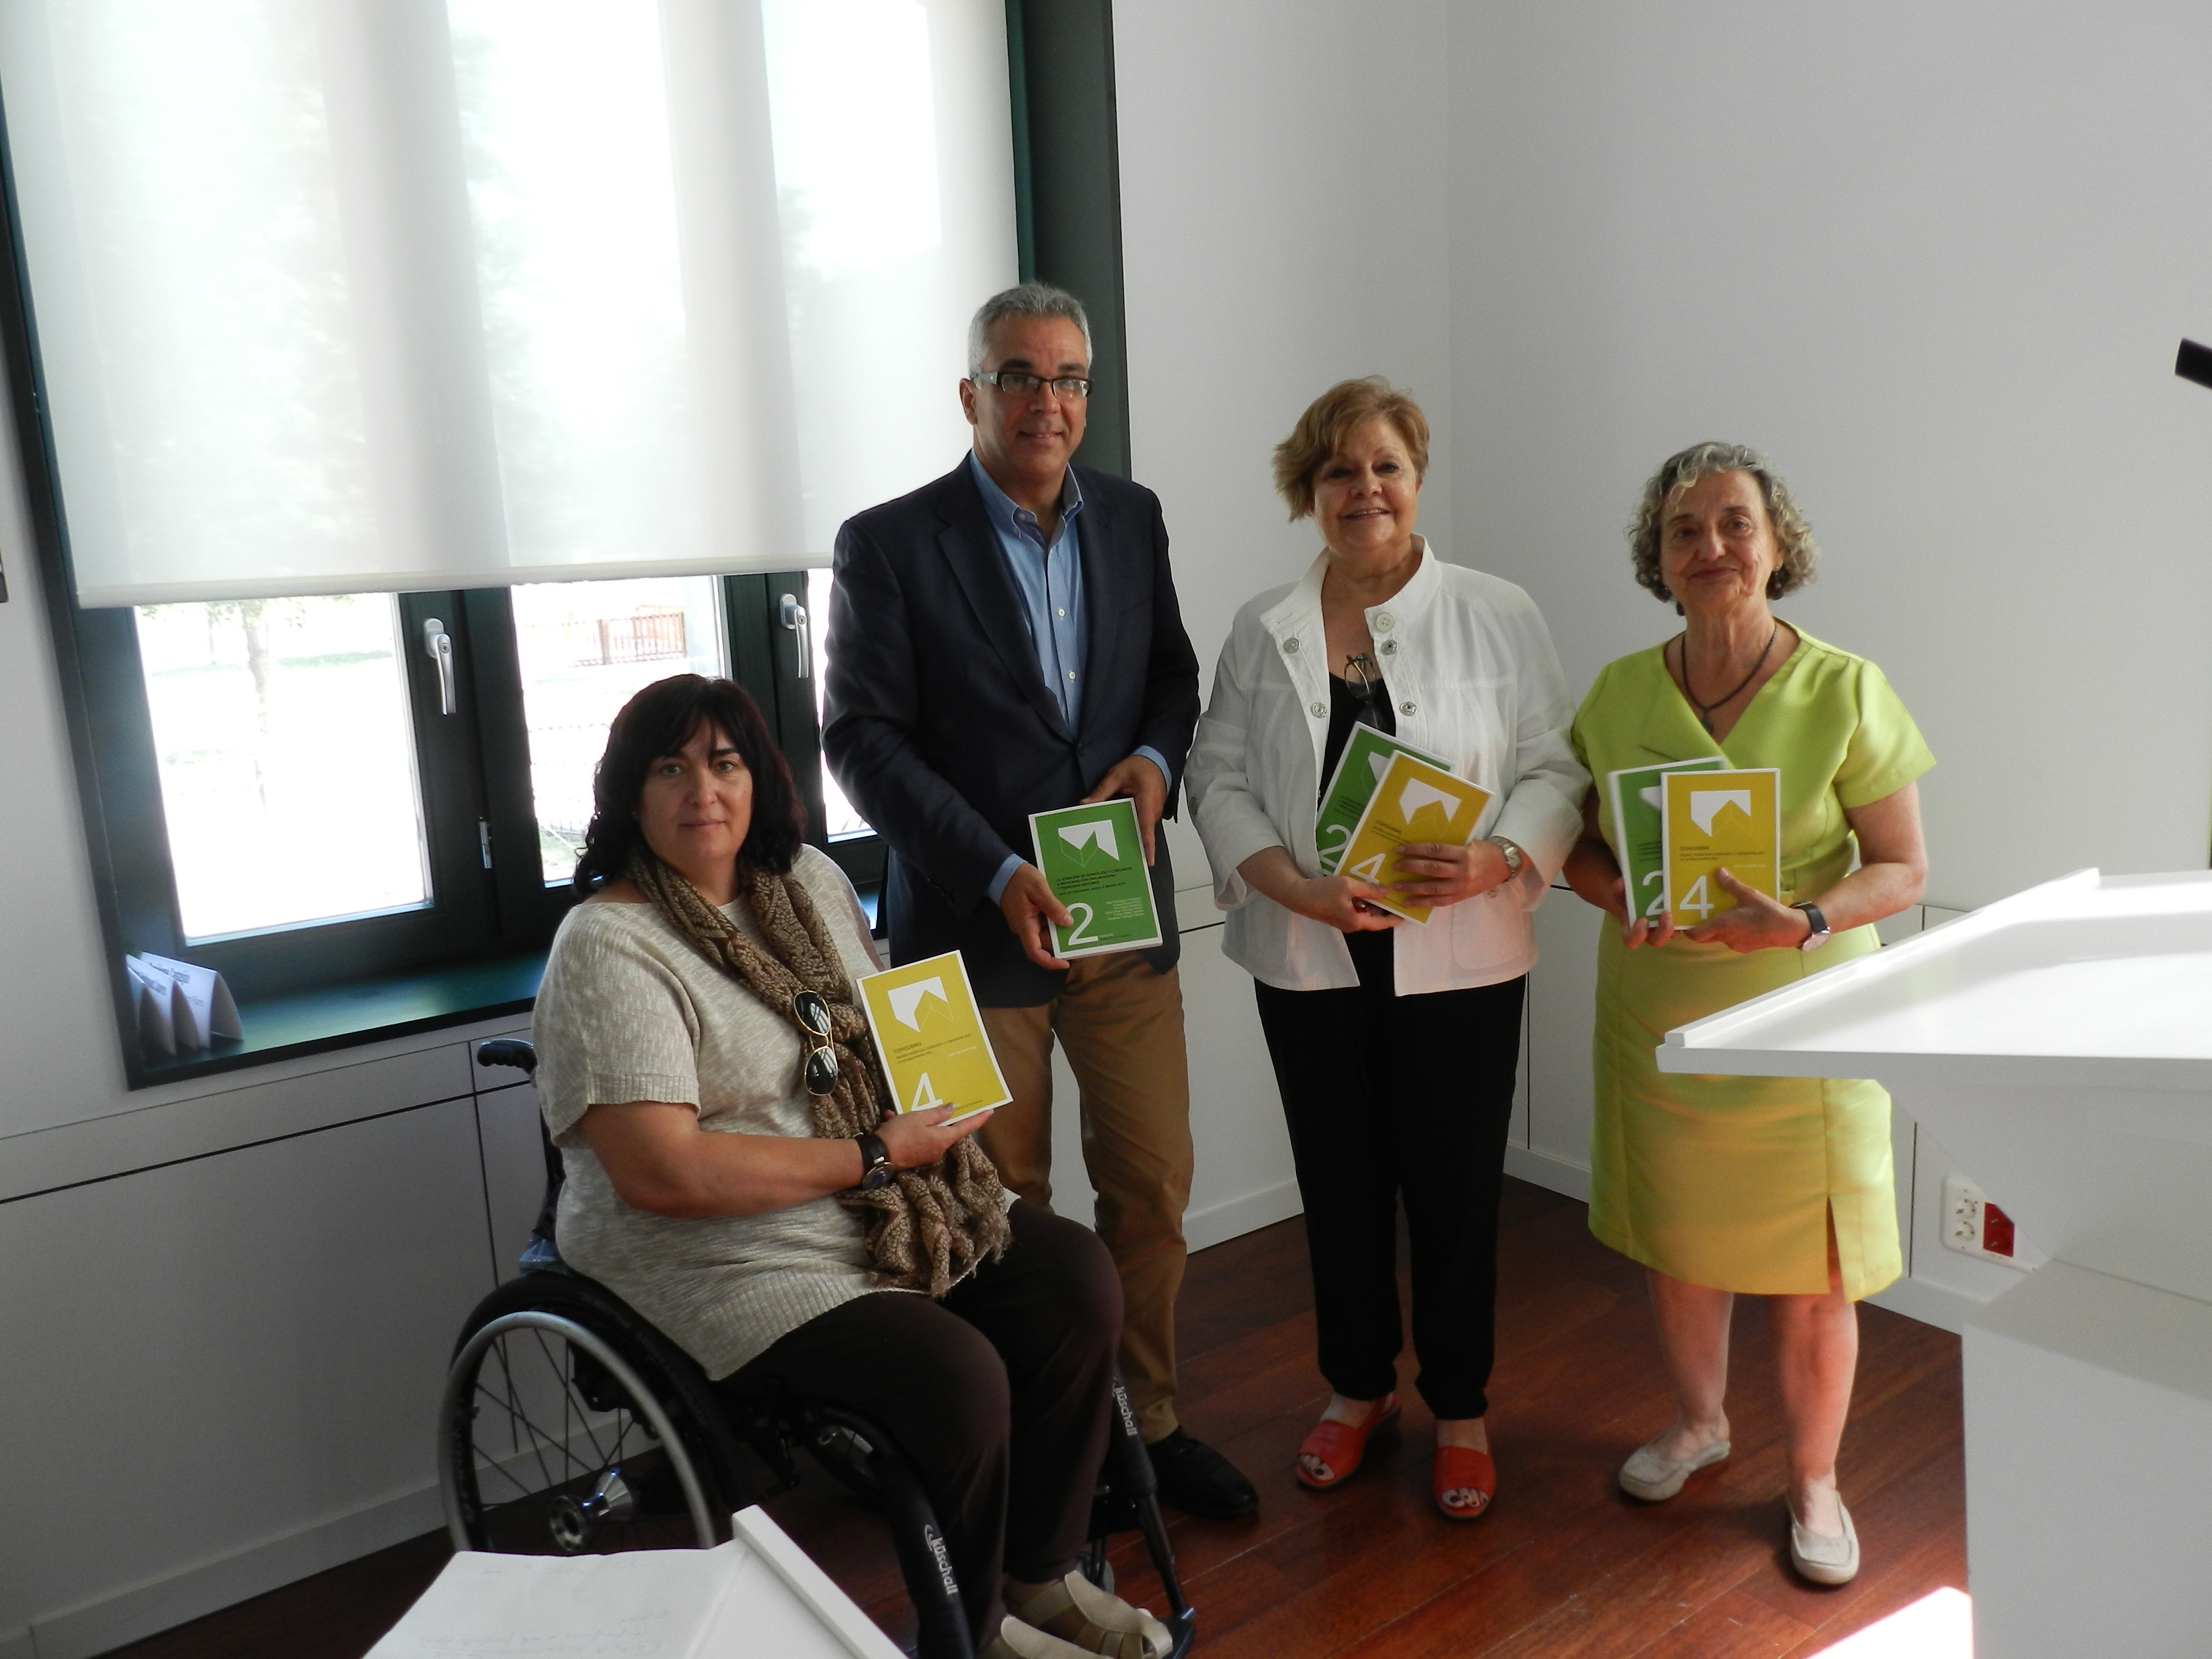 Mayte Gallego, Carlos Izquierdo, Pilar Rodríguez y Rosa Blanca Pérez